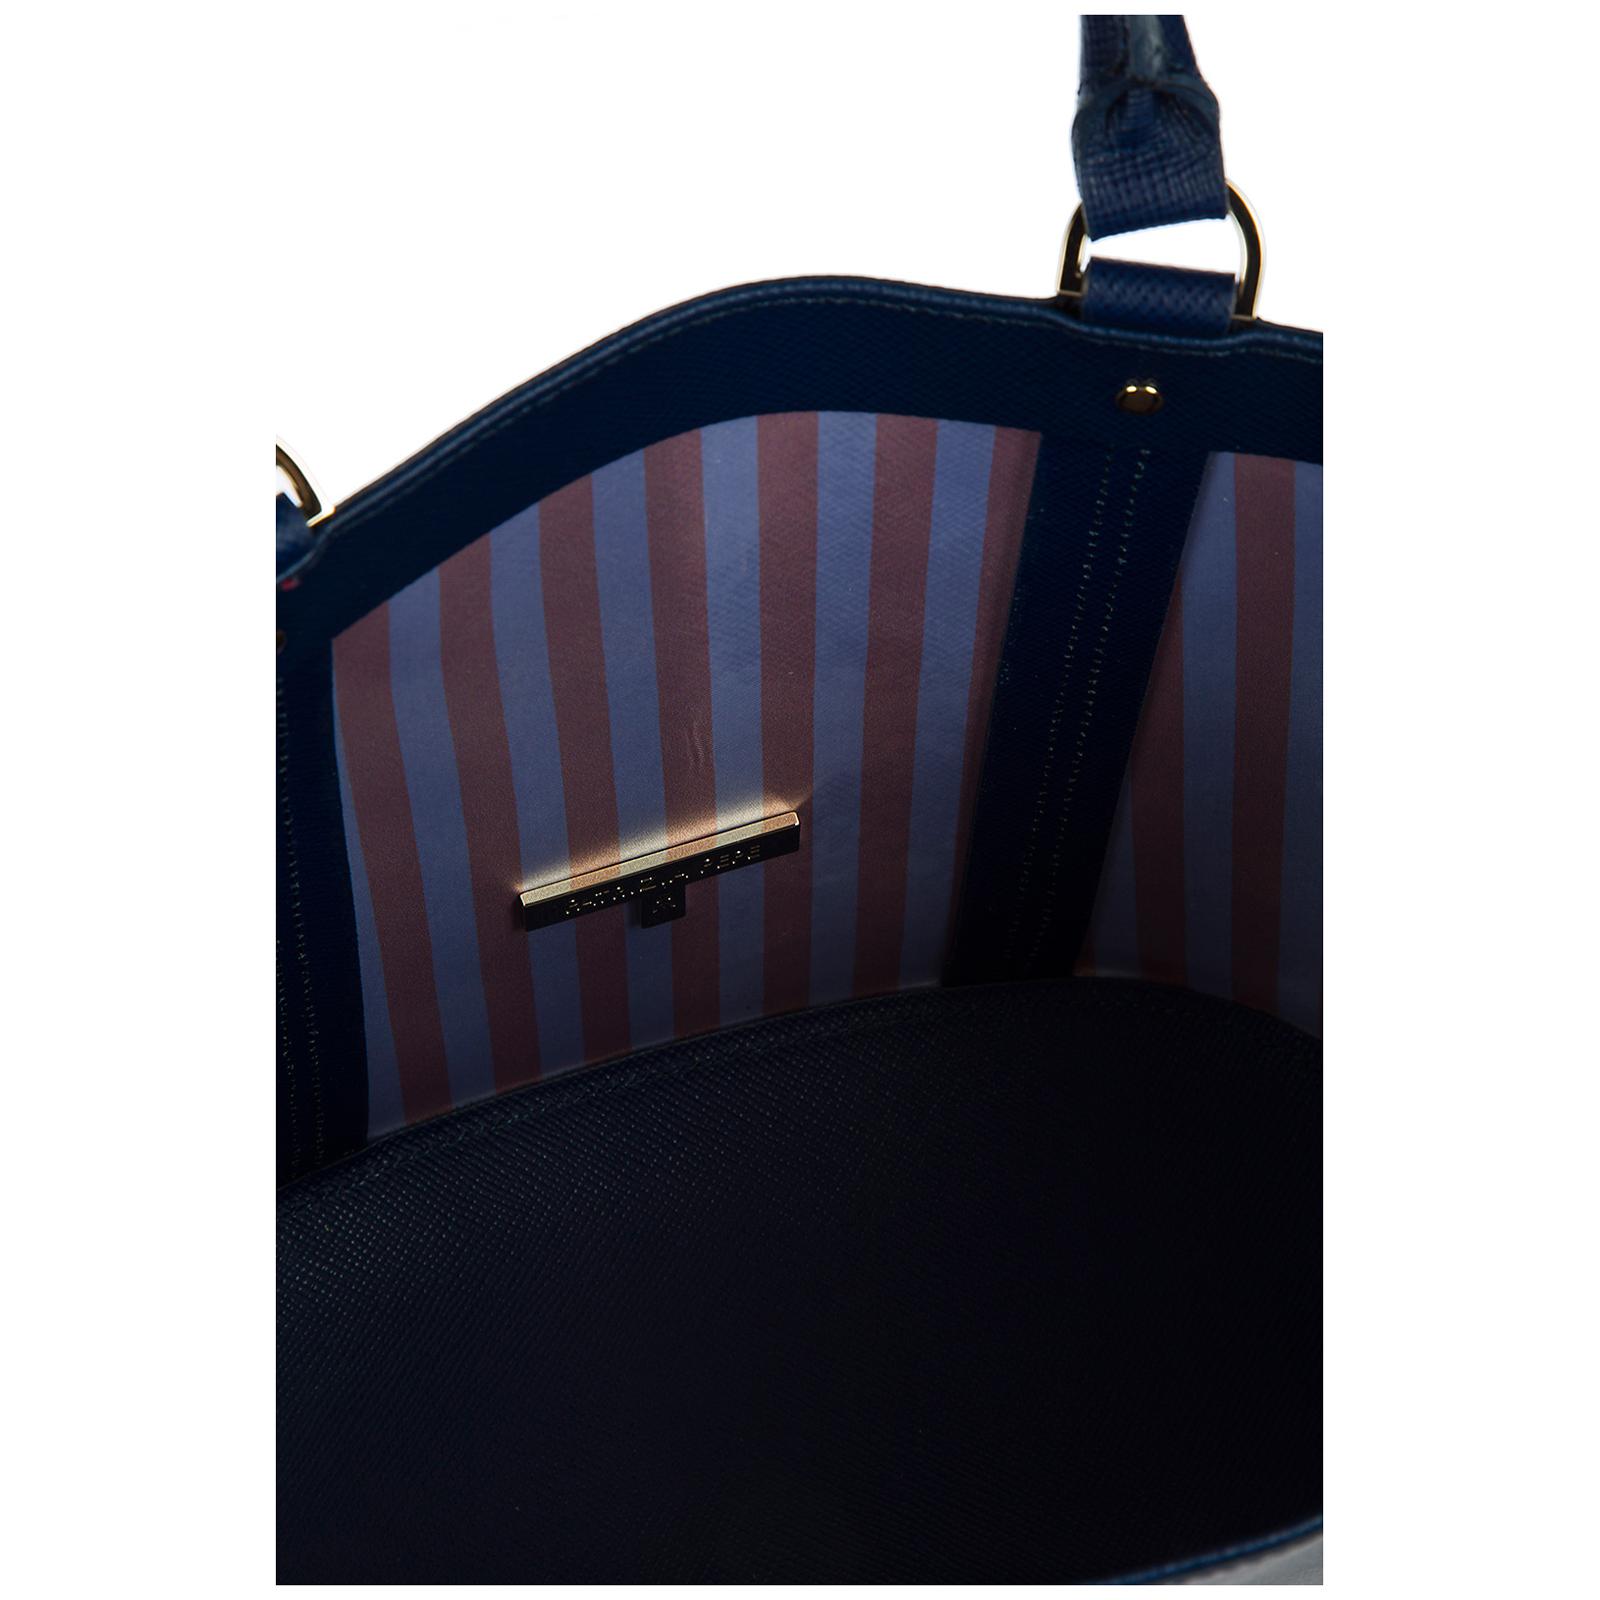 4f69b3c49580 Bucket bag Patrizia Pepe 2V6978 A2PU XP39 blue   geometric coral ...